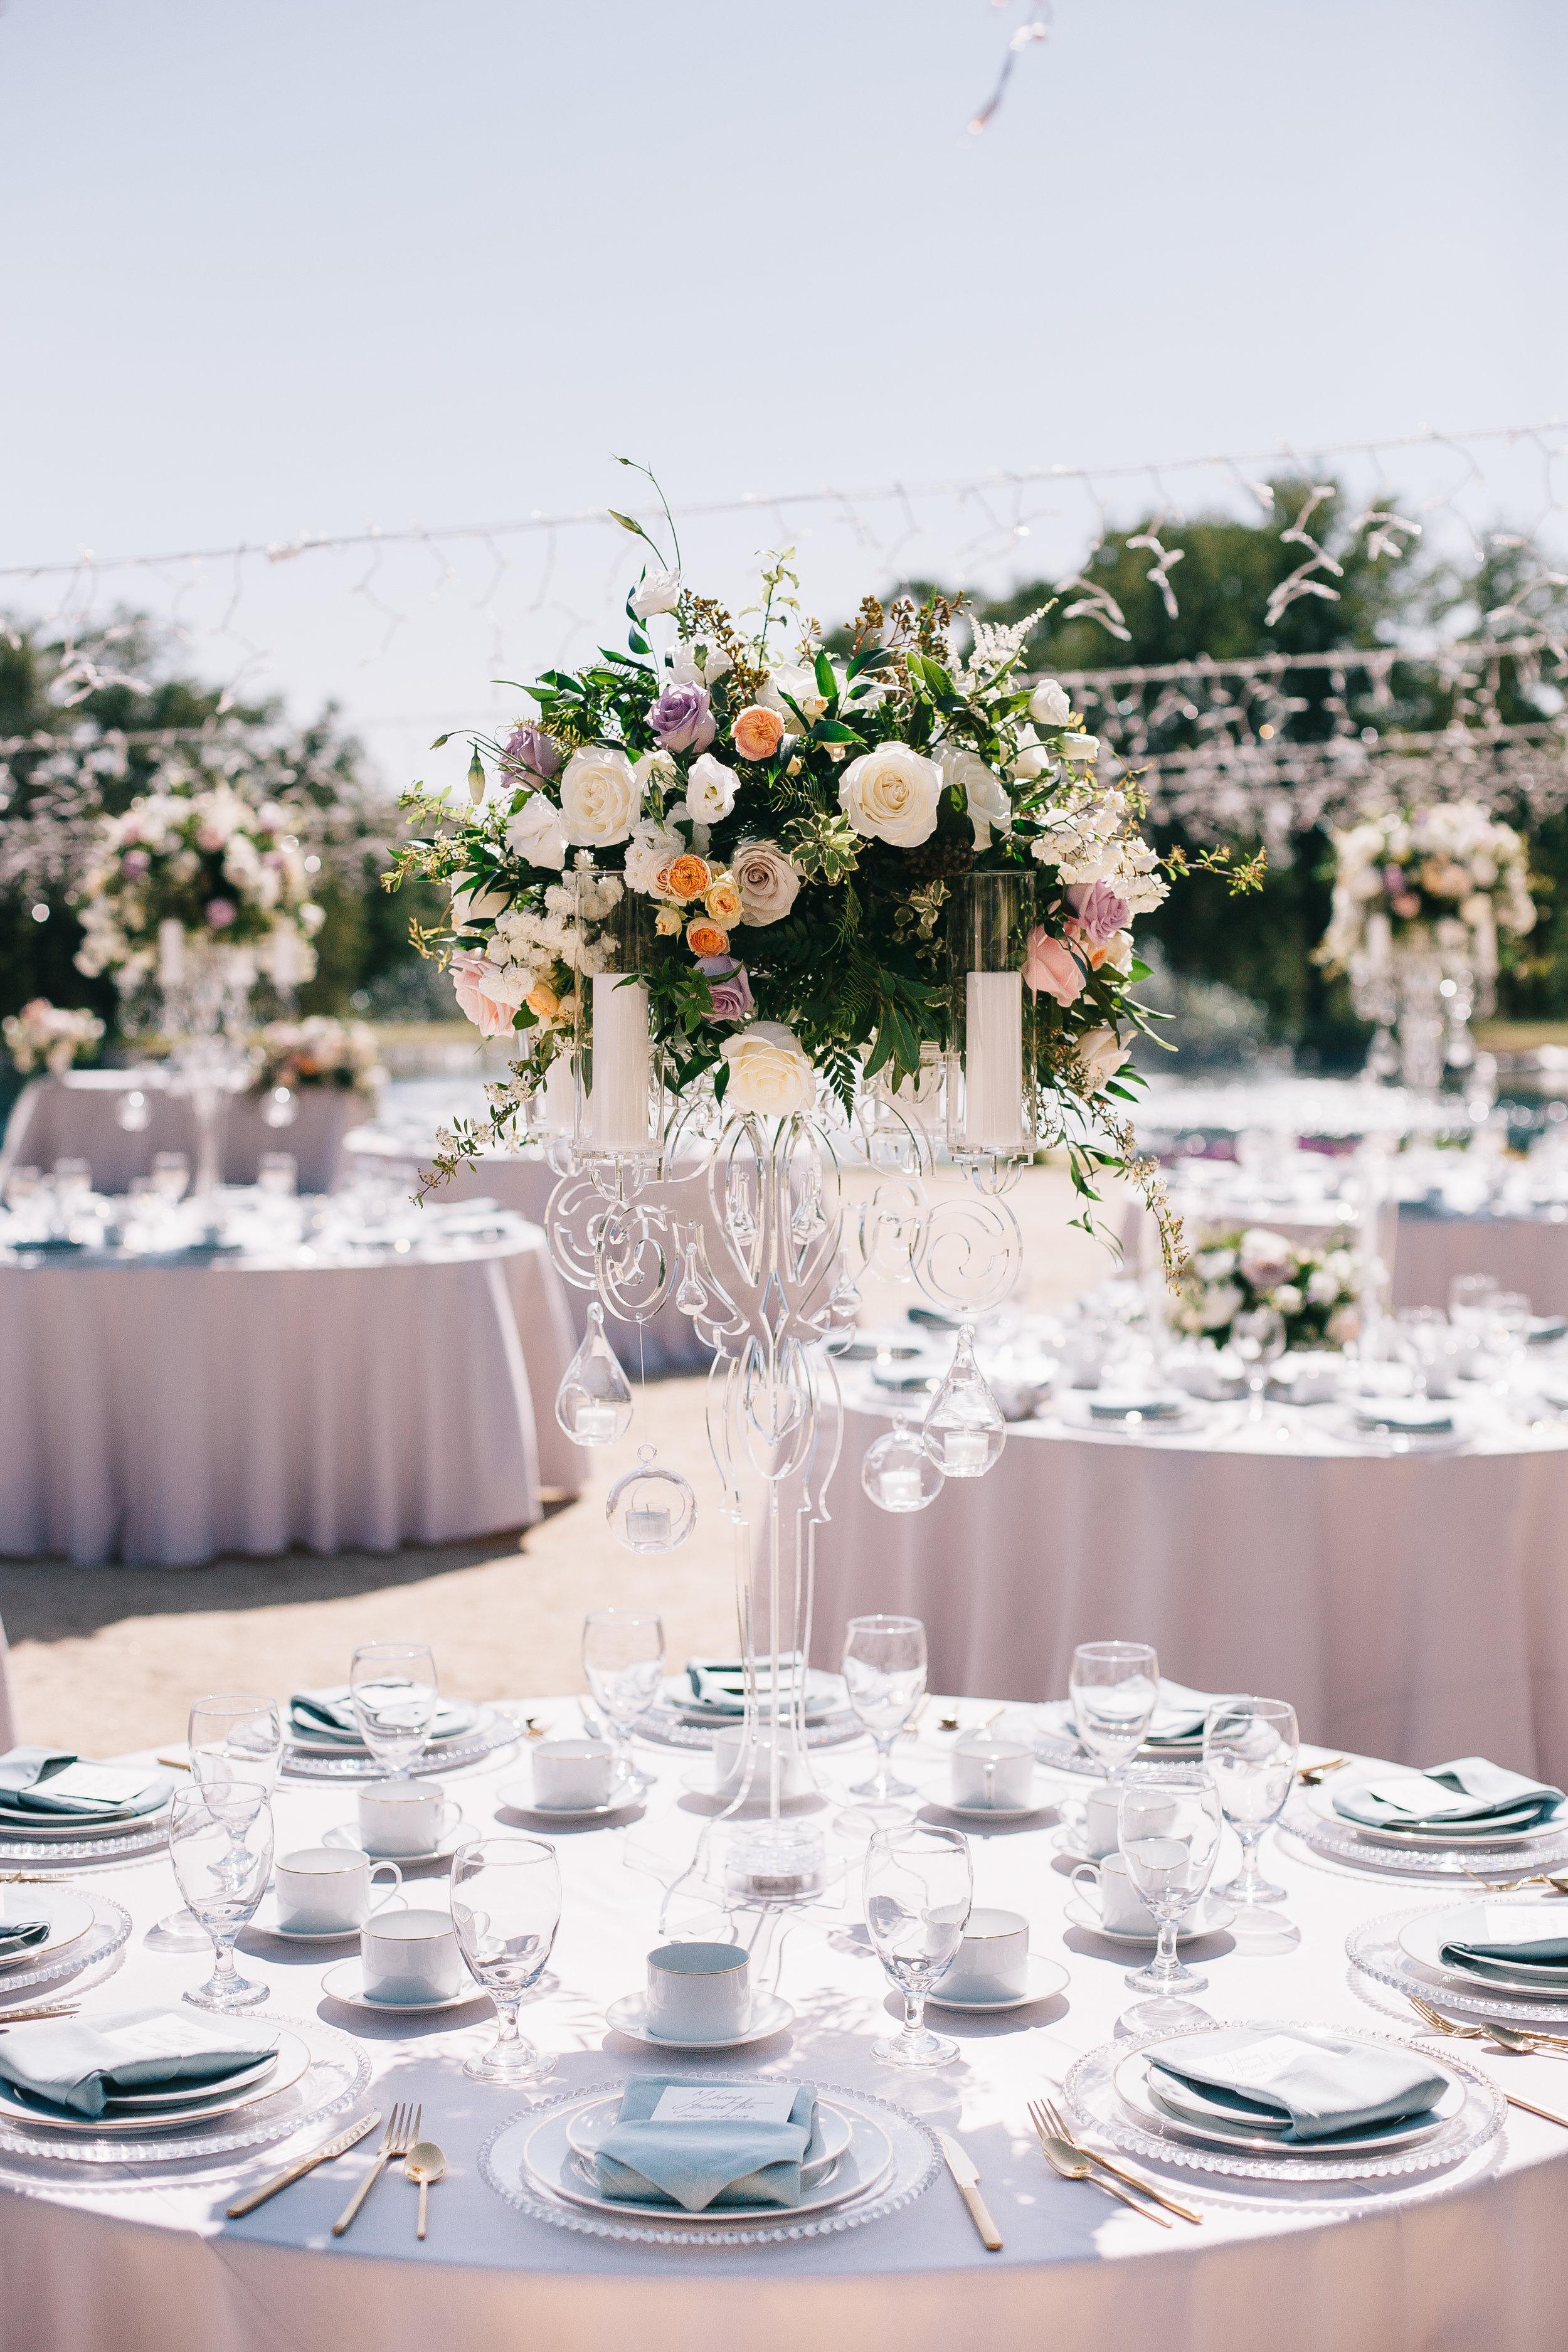 Violette-fleurs-event-design-roseville-anna-perevertaylo-rancho-robles-vinyards-Detail-Decor-Detail-Destination-Curated.jpg